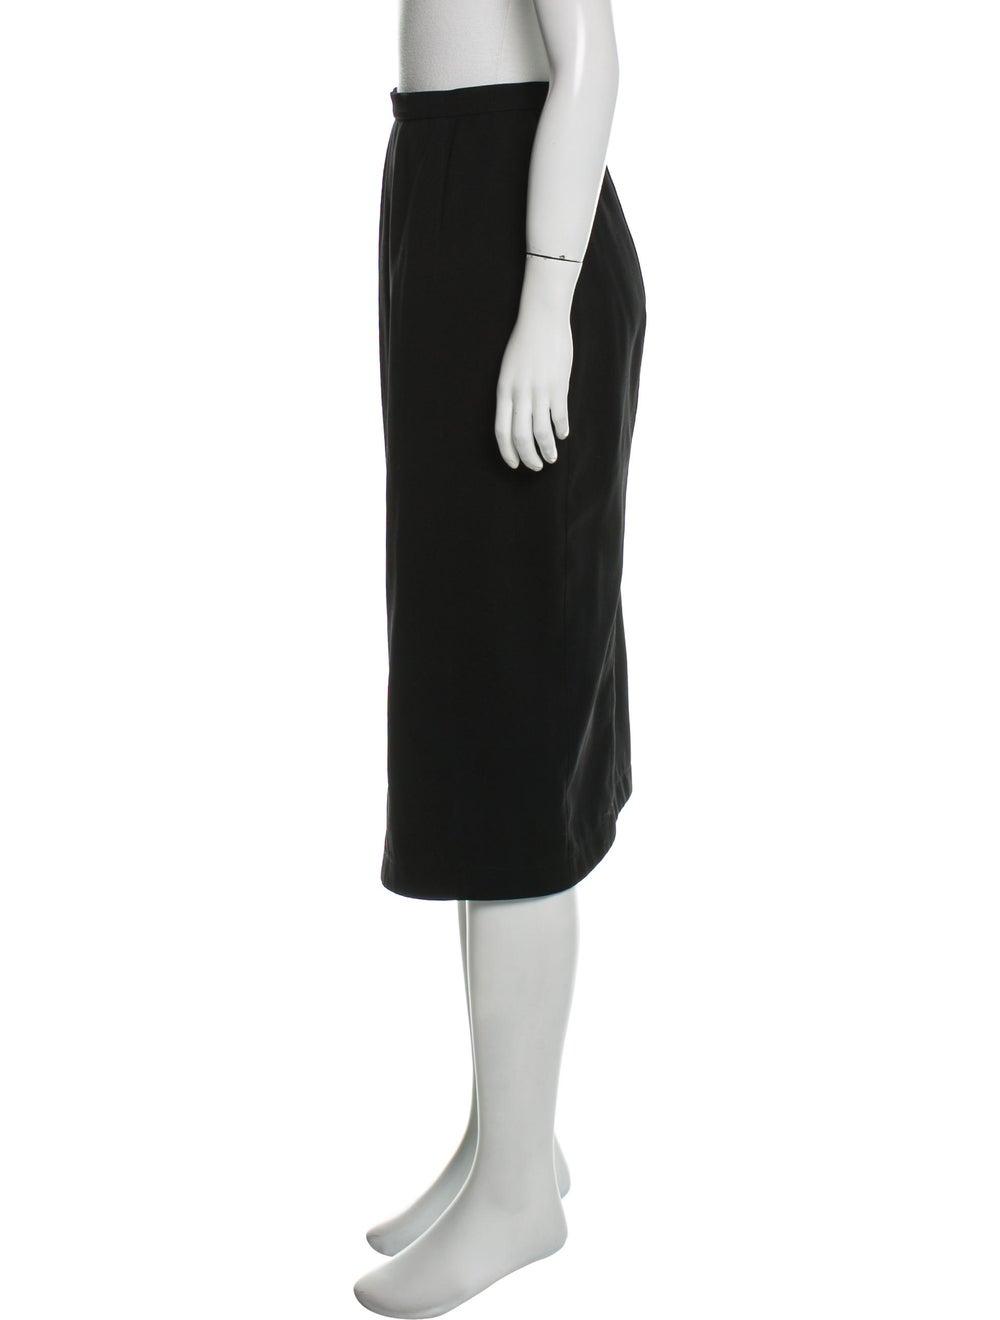 Thierry Mugler Midi Pencil Skirt Black - image 2